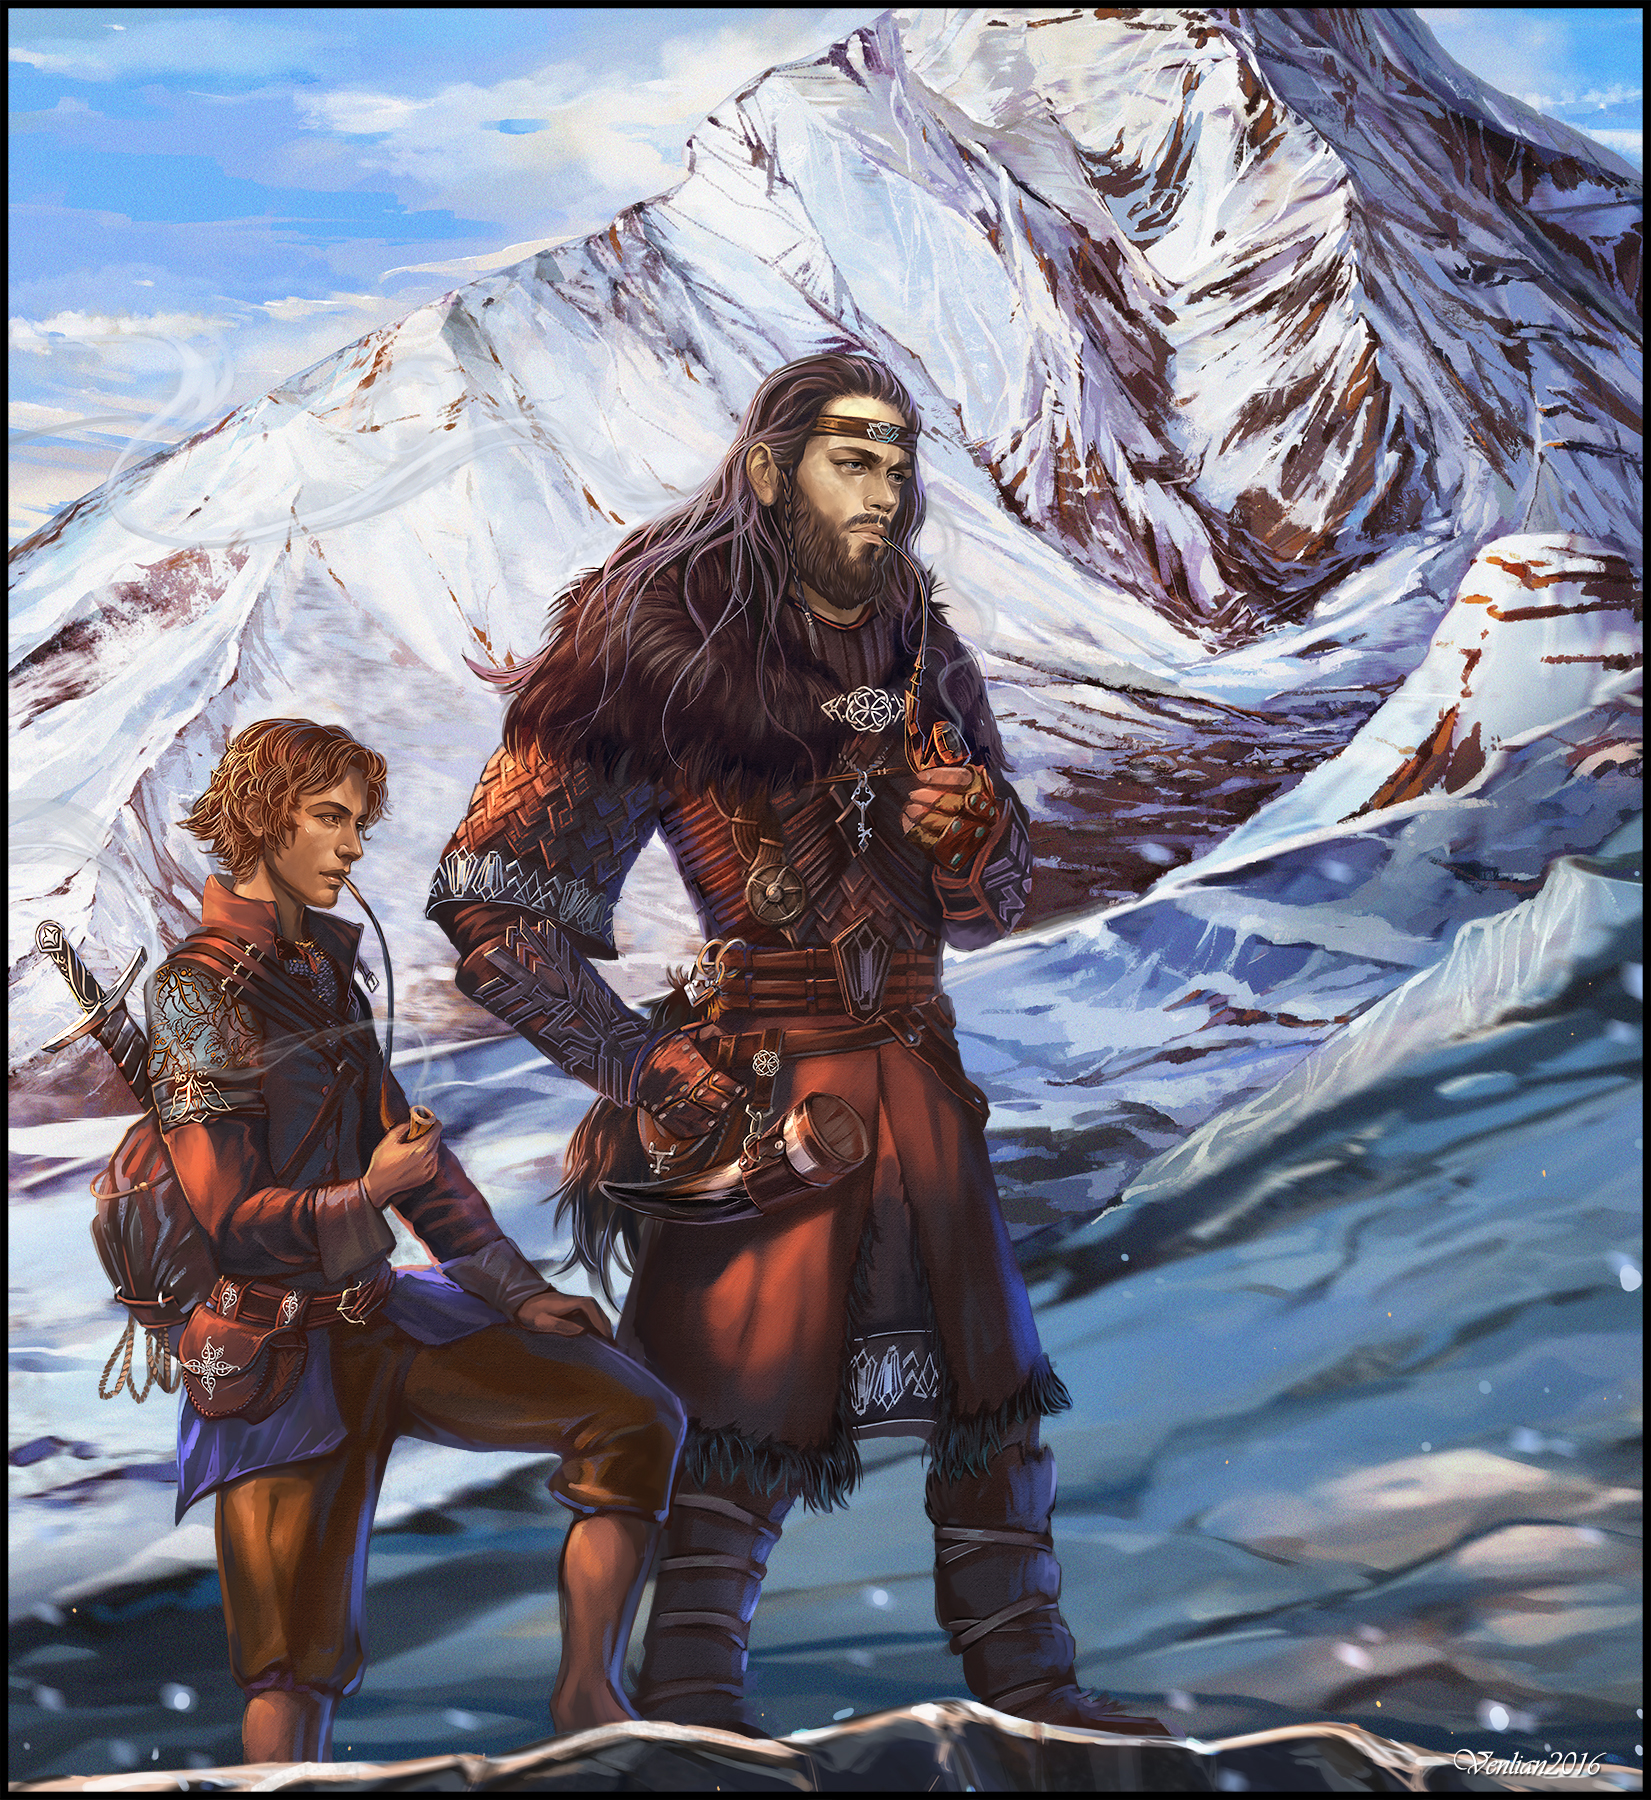 On the Doorstep: Thorin and Bilbo